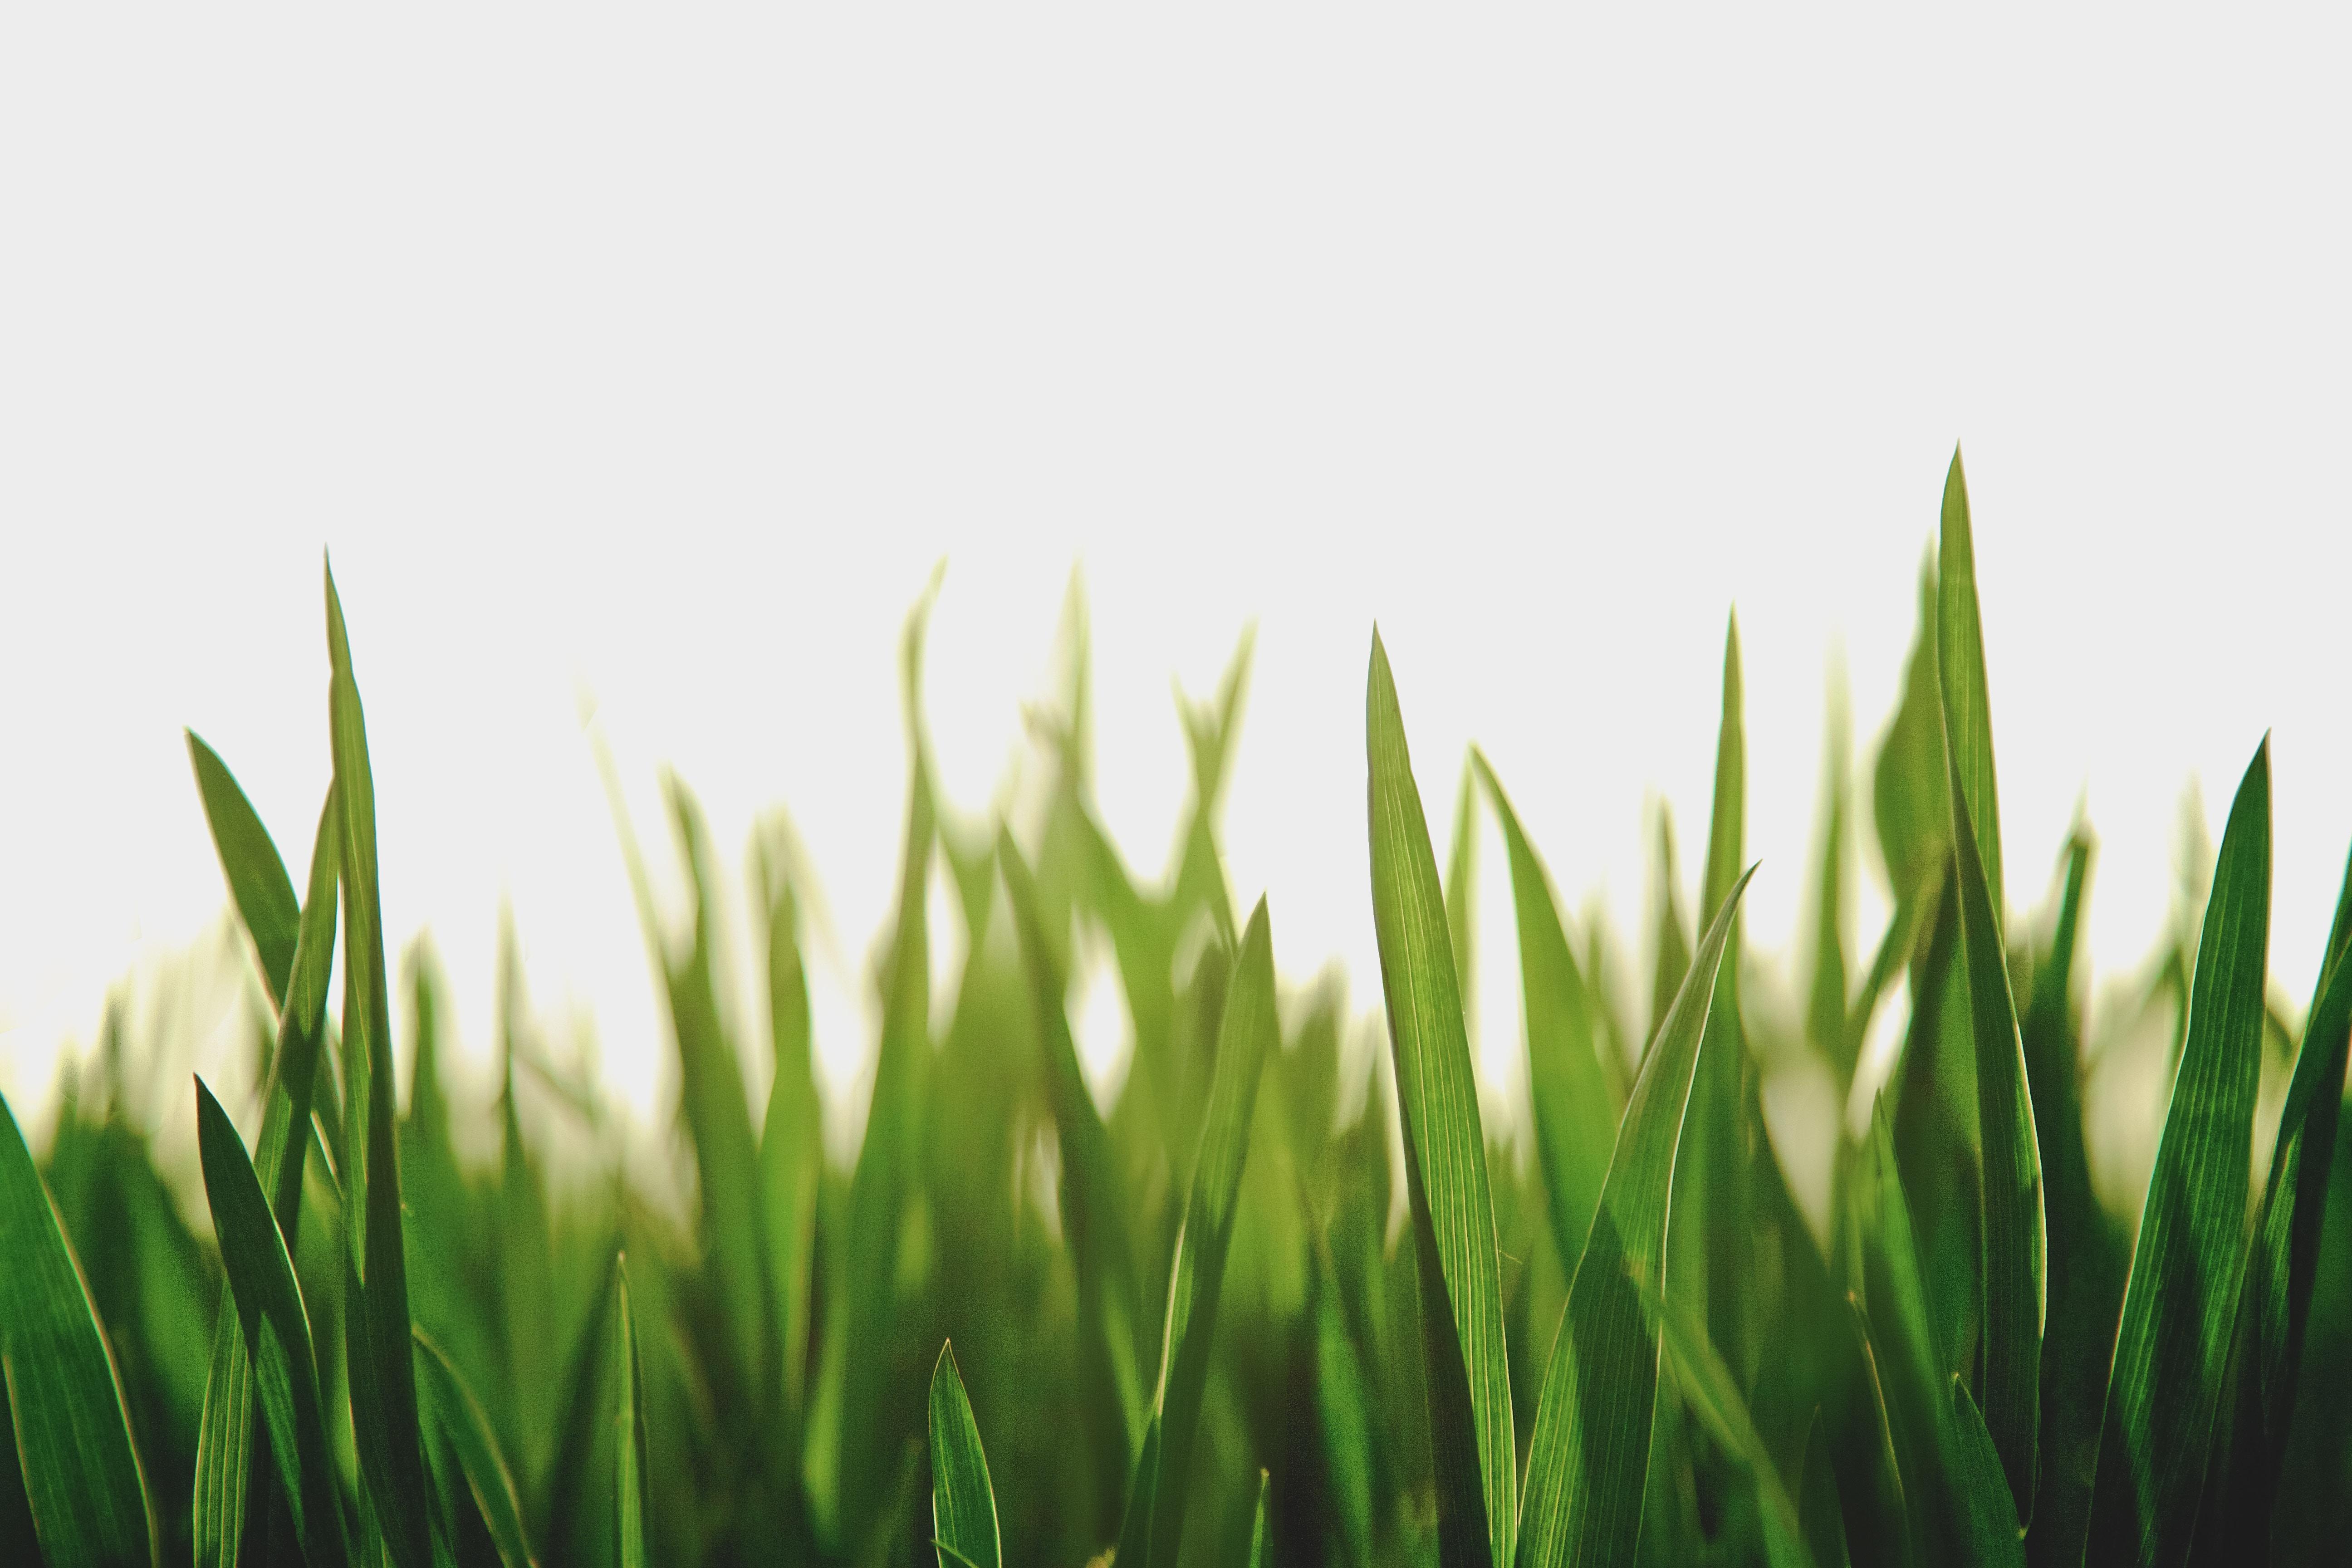 grass. Delighful Grass Closeup Photography Of Green Grassfield Intended Grass